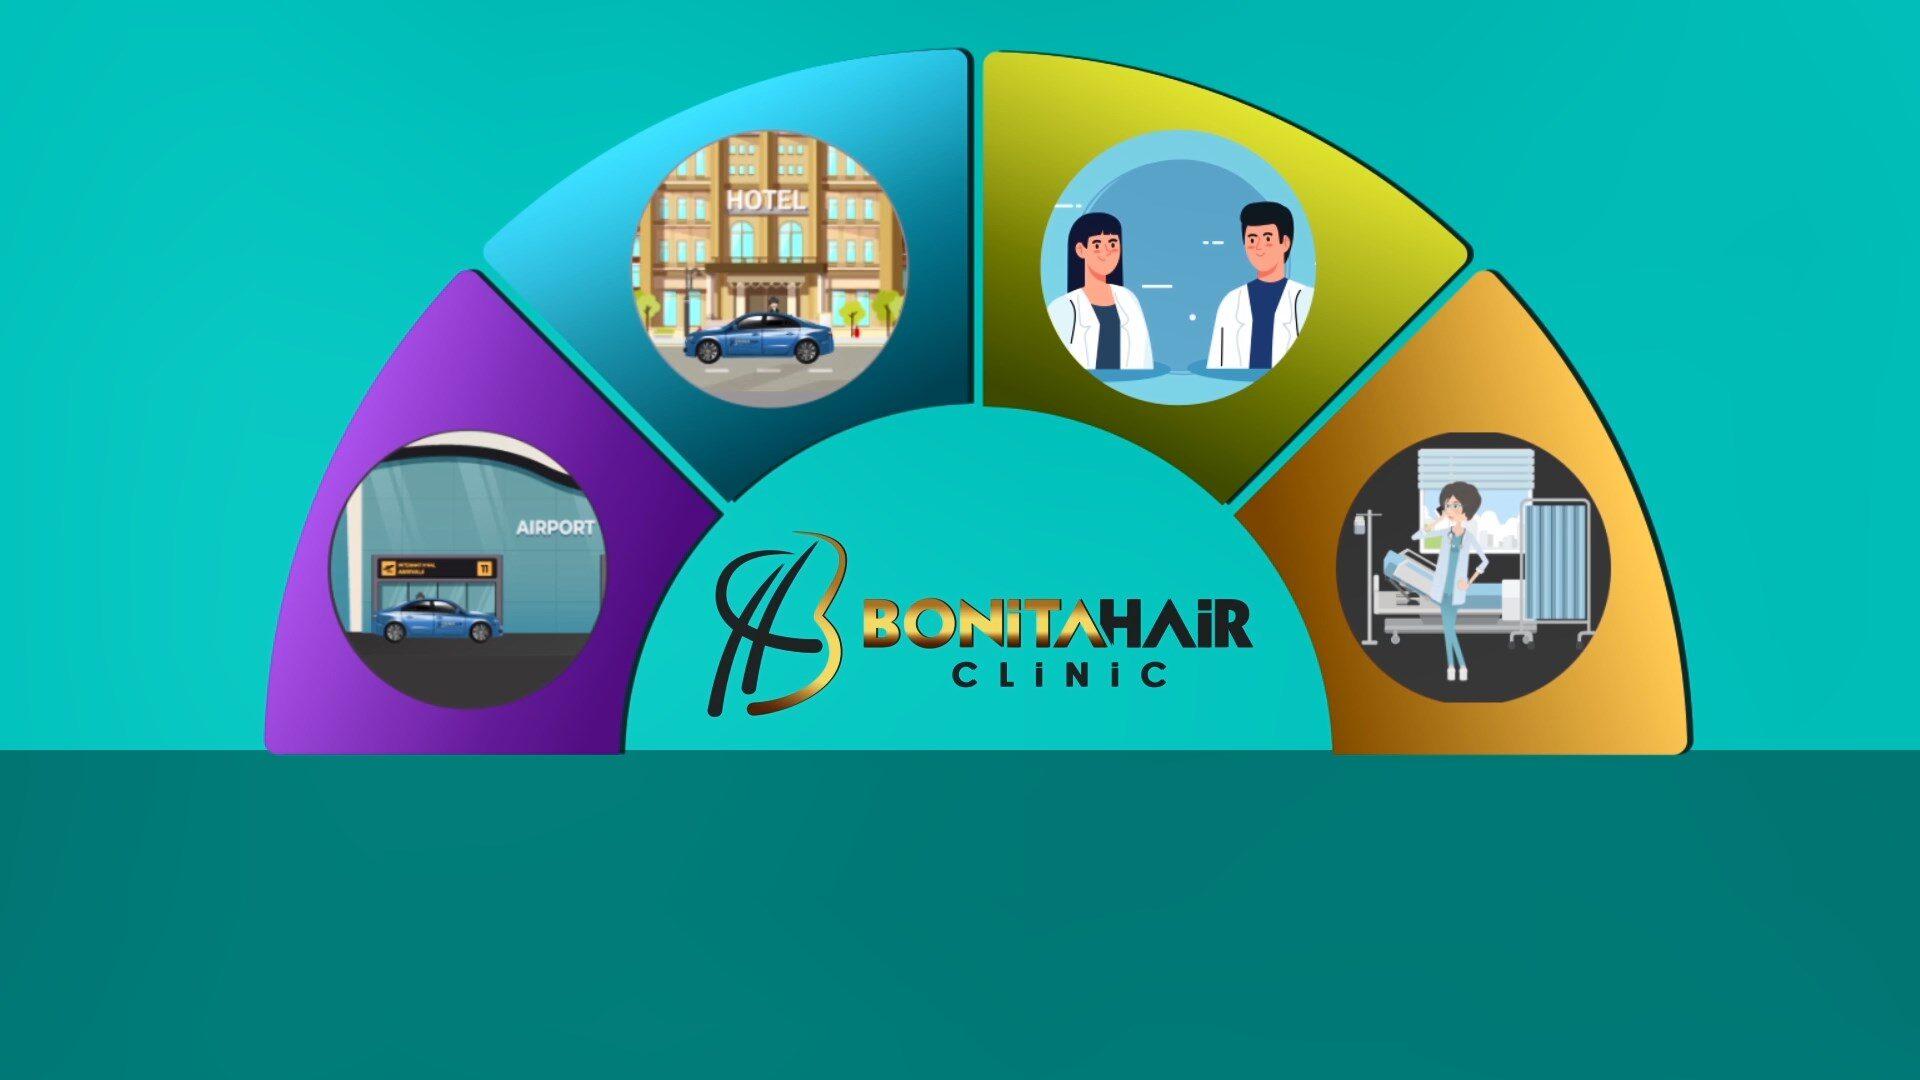 BonitaHairClinicPaylaşım.mp4 snapshot 00.52.877 1920x1080 - BONITA HAIR CLINIC ANİMASYON FİLMİ